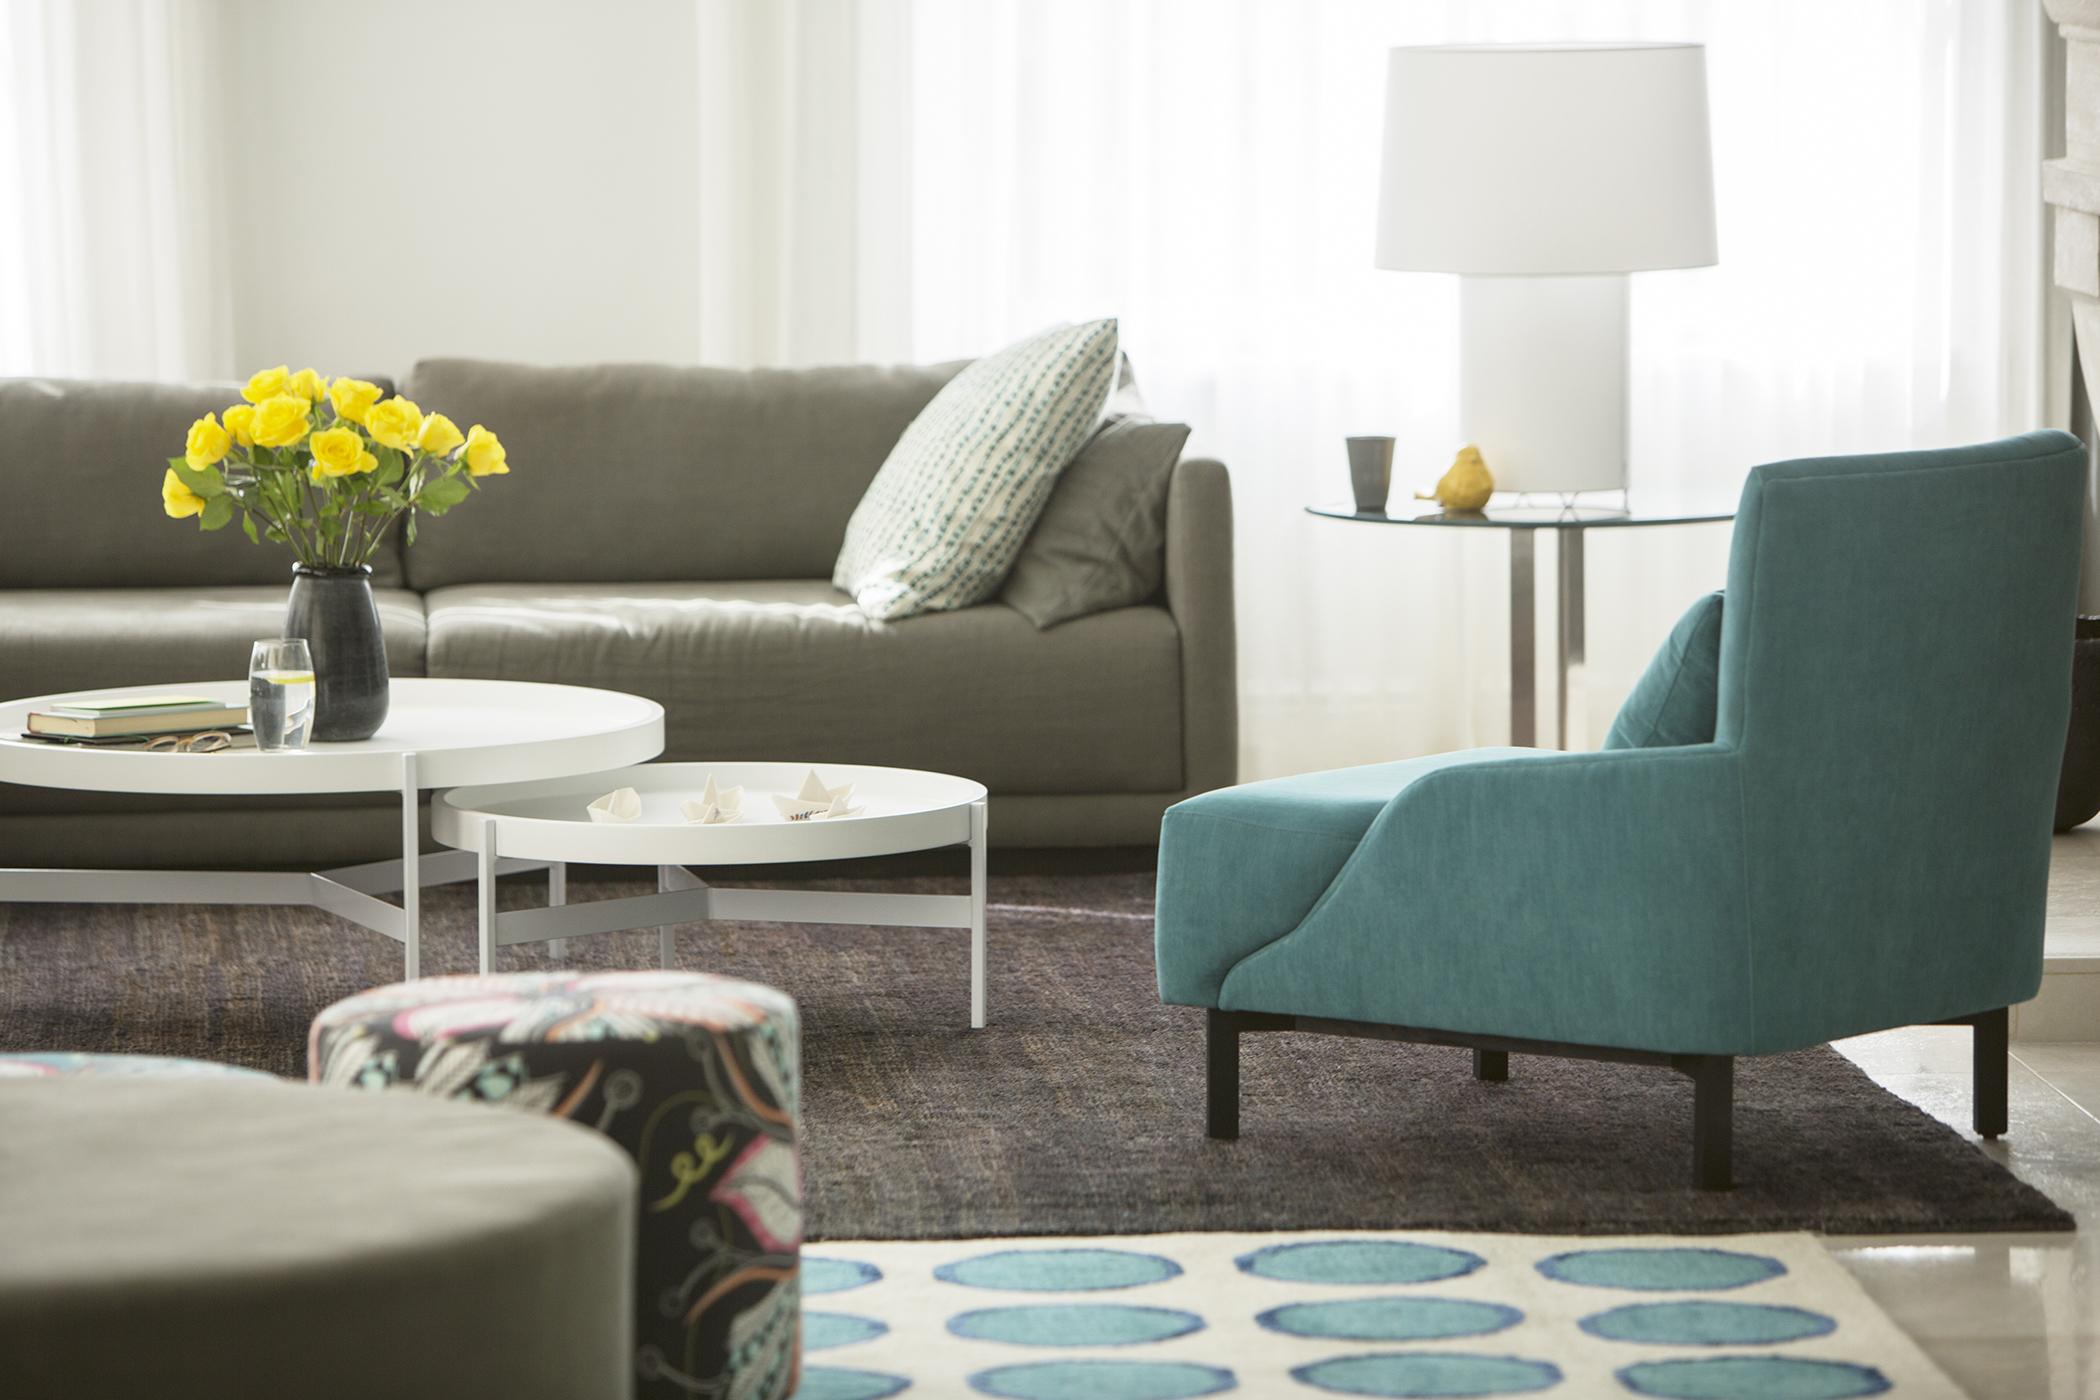 Home furnishings on sale